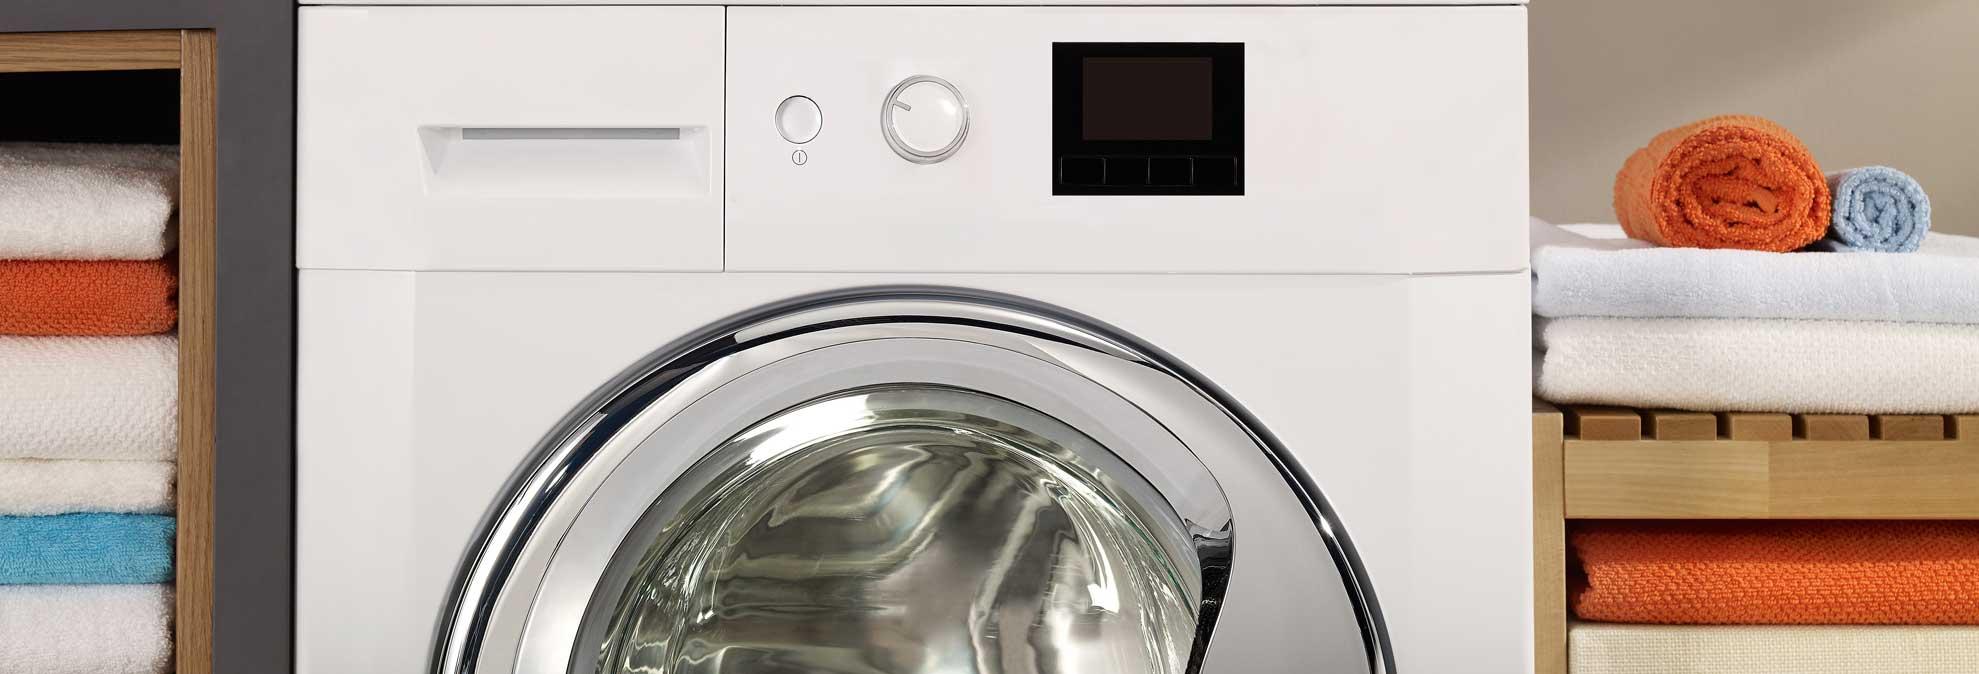 Top 15 Large Capacity Washing Machines Consumer Reports